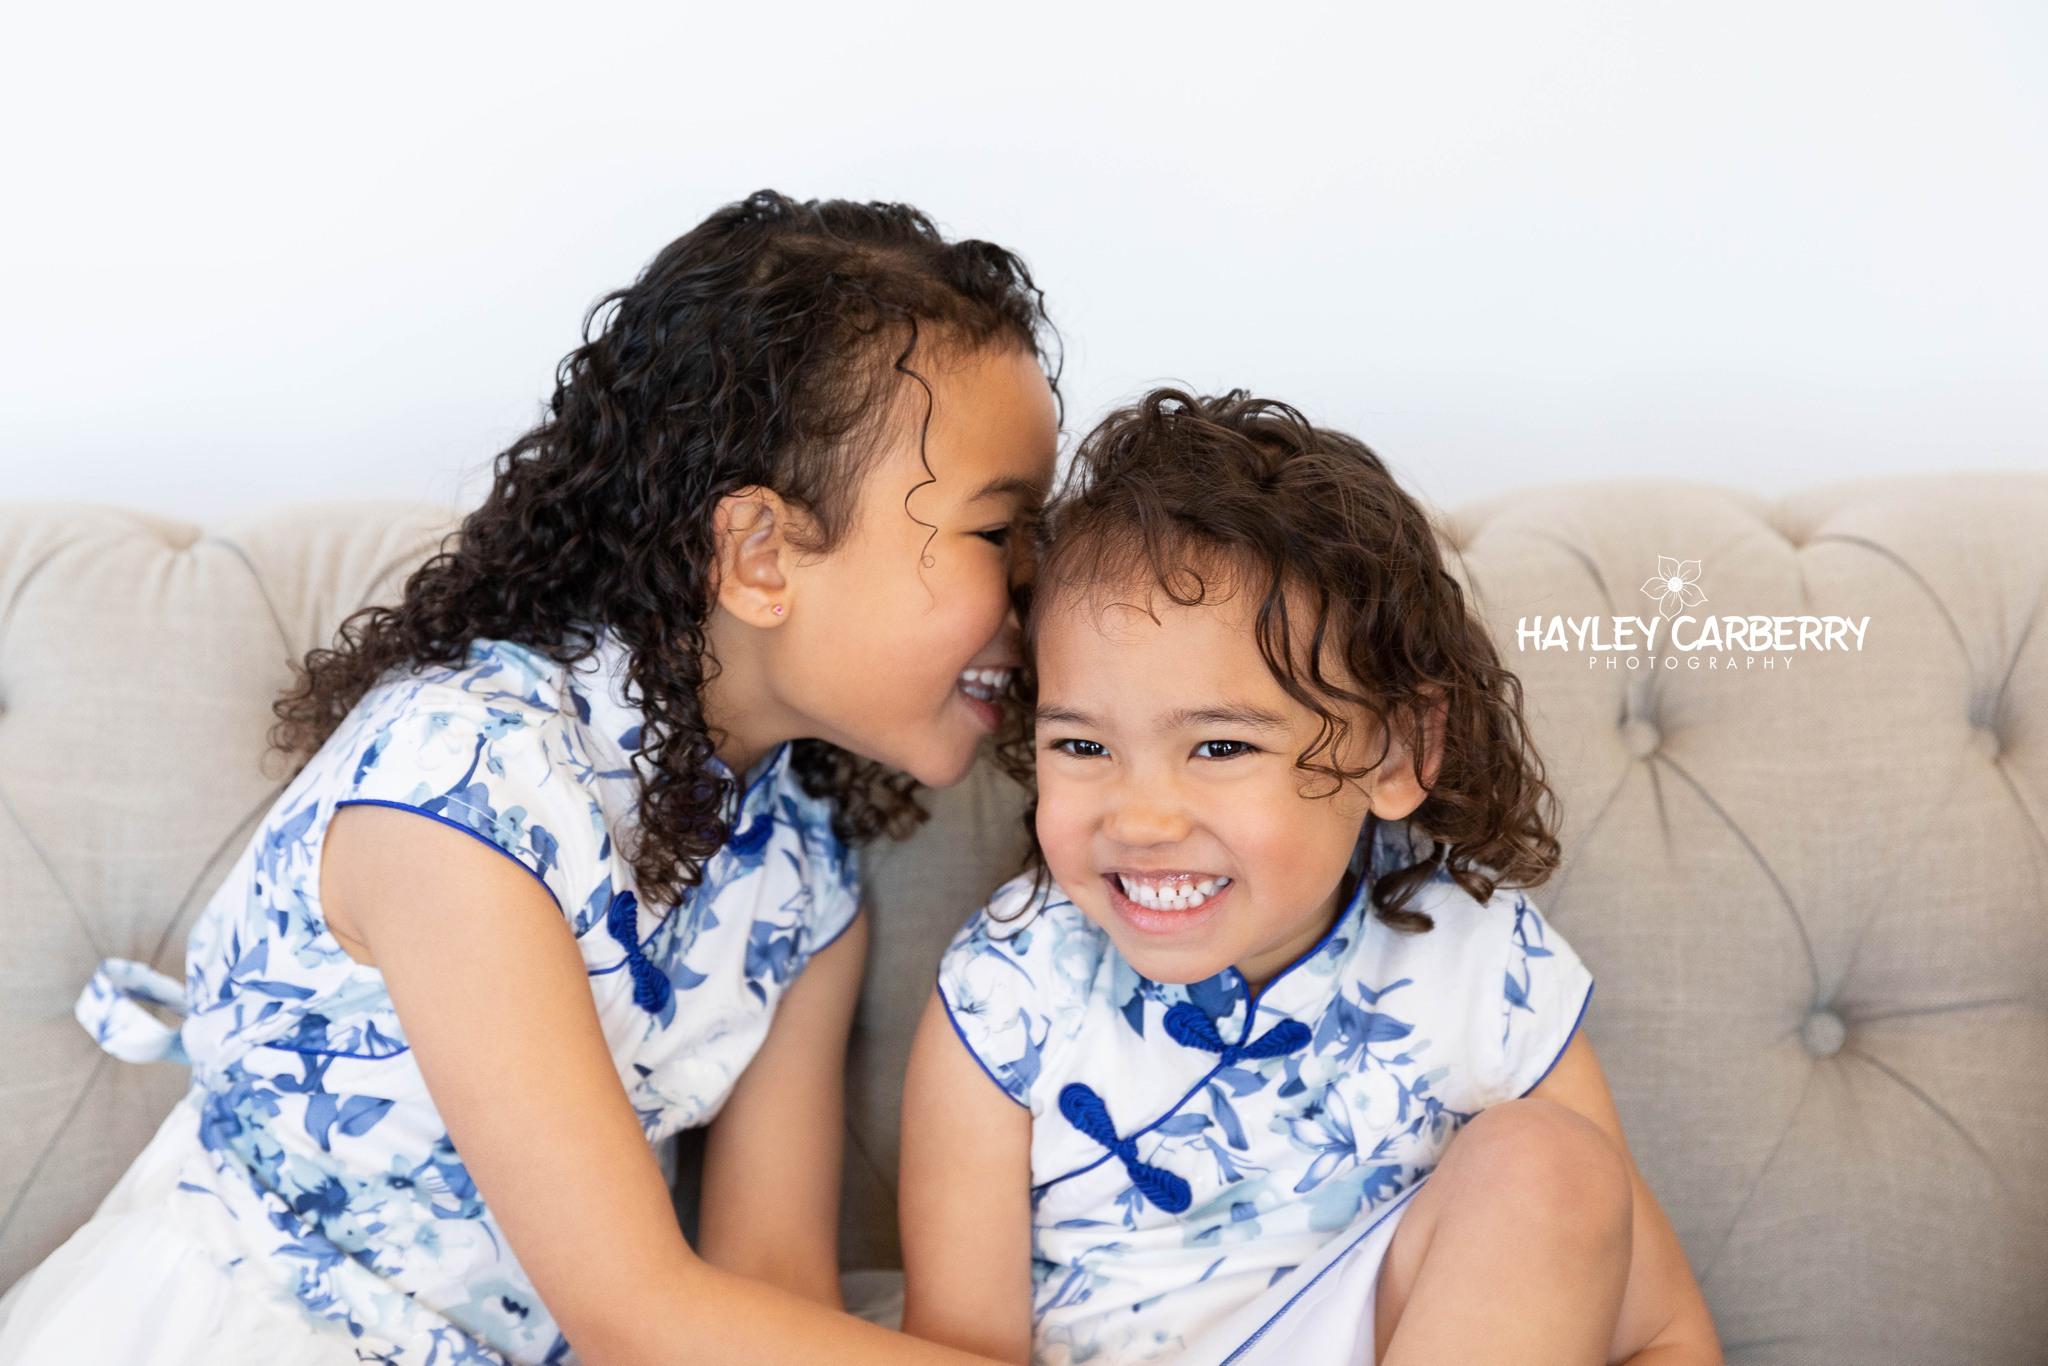 Canberra Family Baby Portrait Children Photographer (1 of 1)-6_WEB-2.jpg